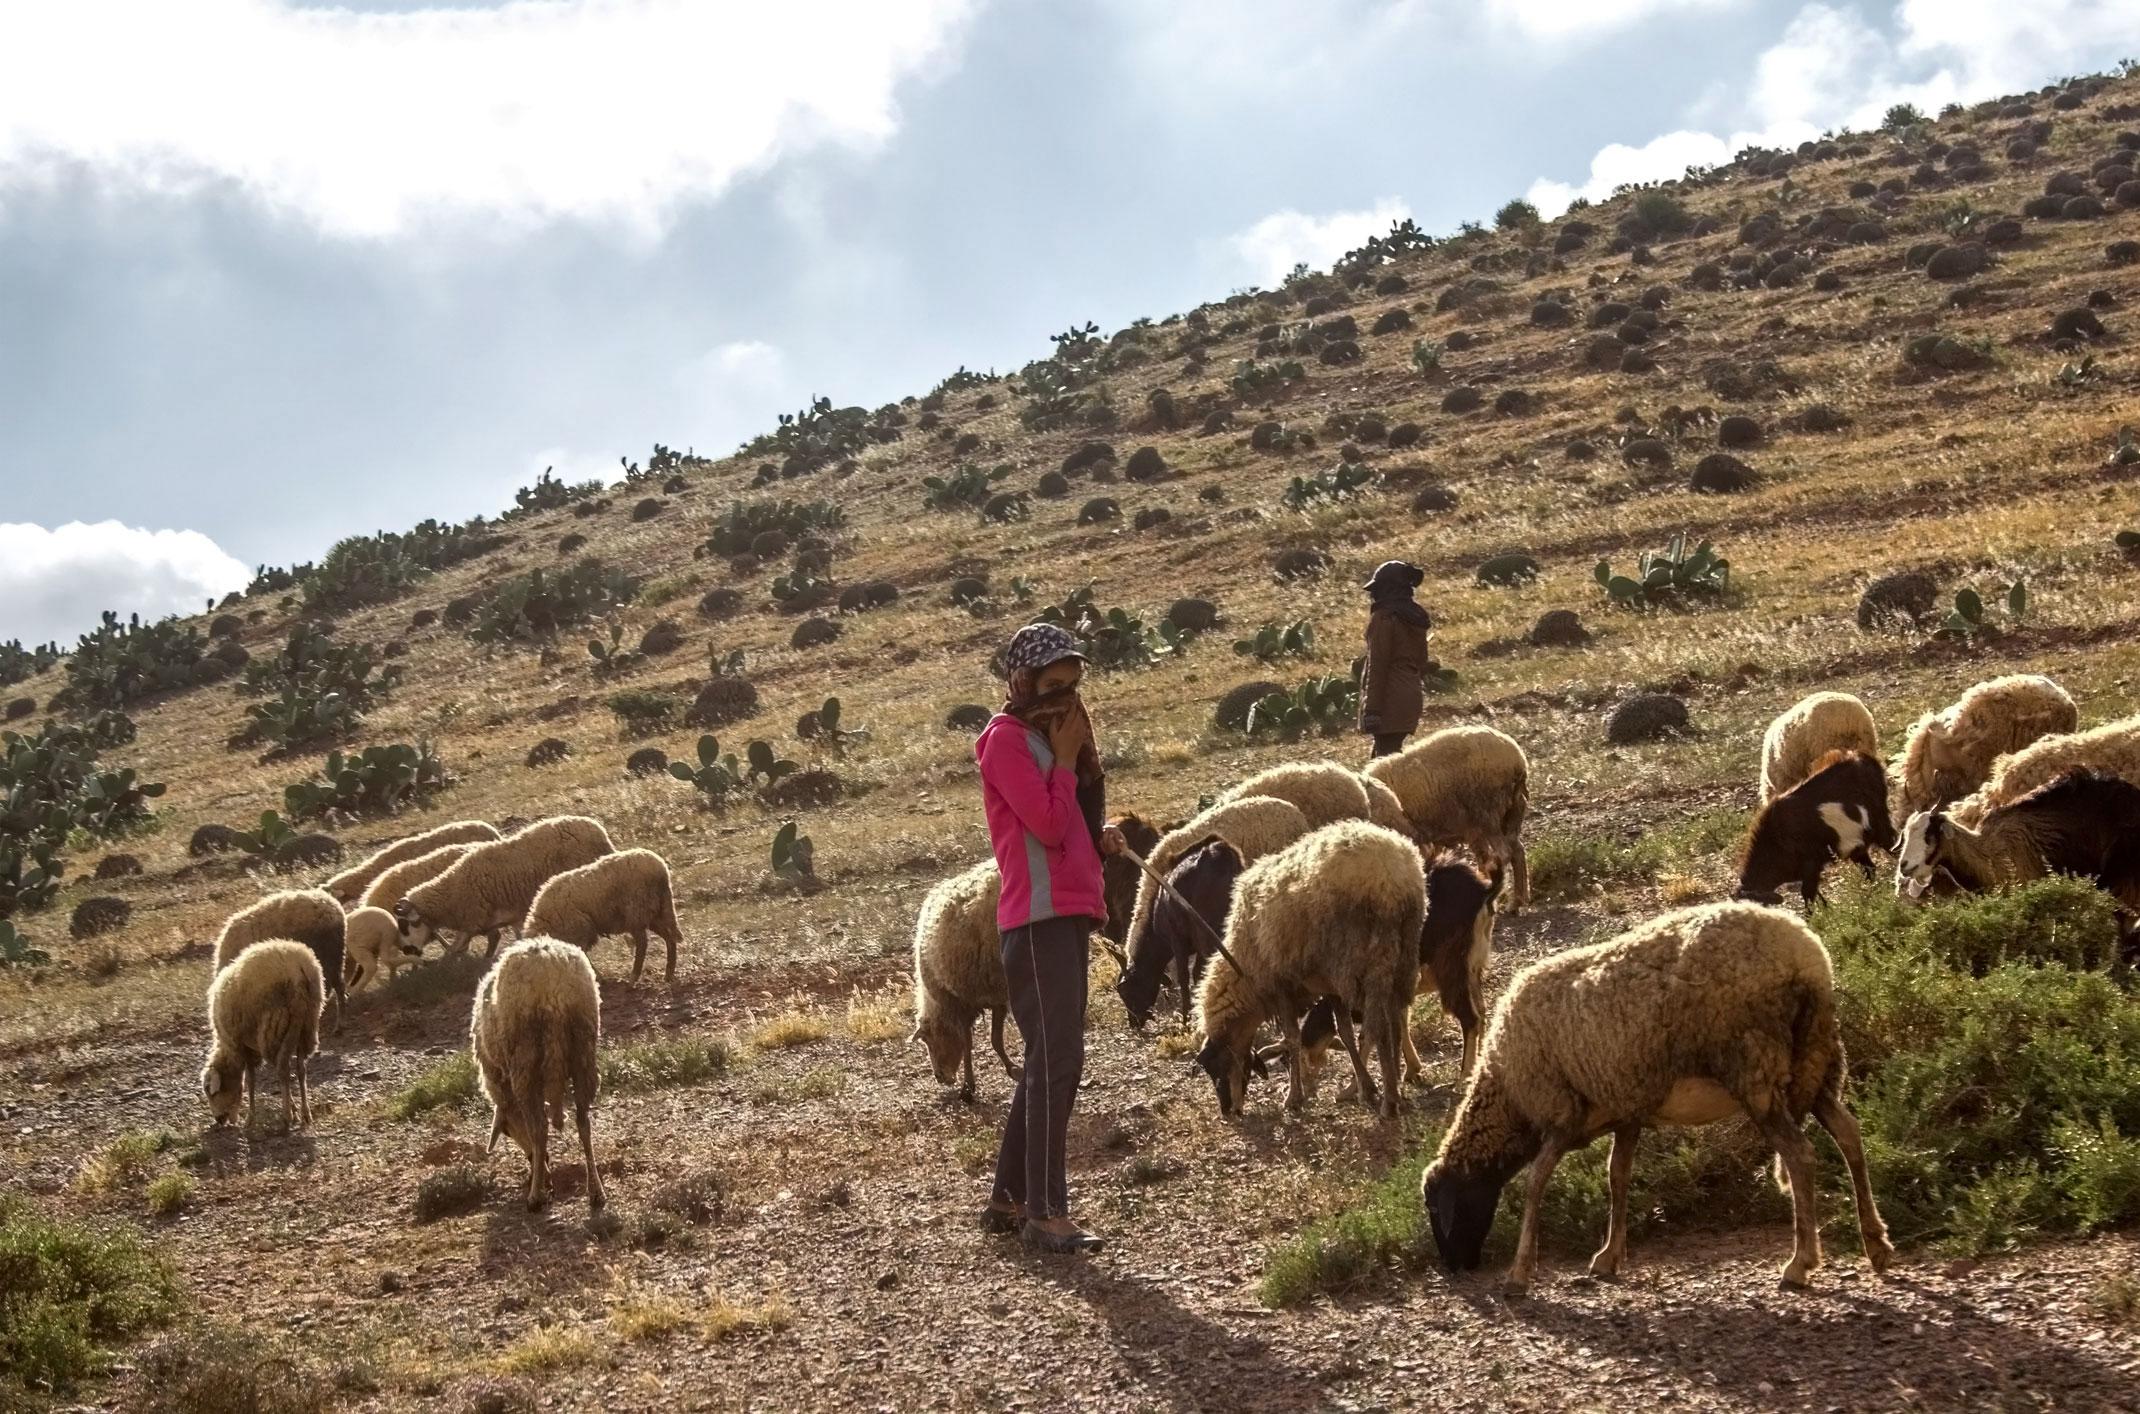 Maroko.Pastuszka z owcami